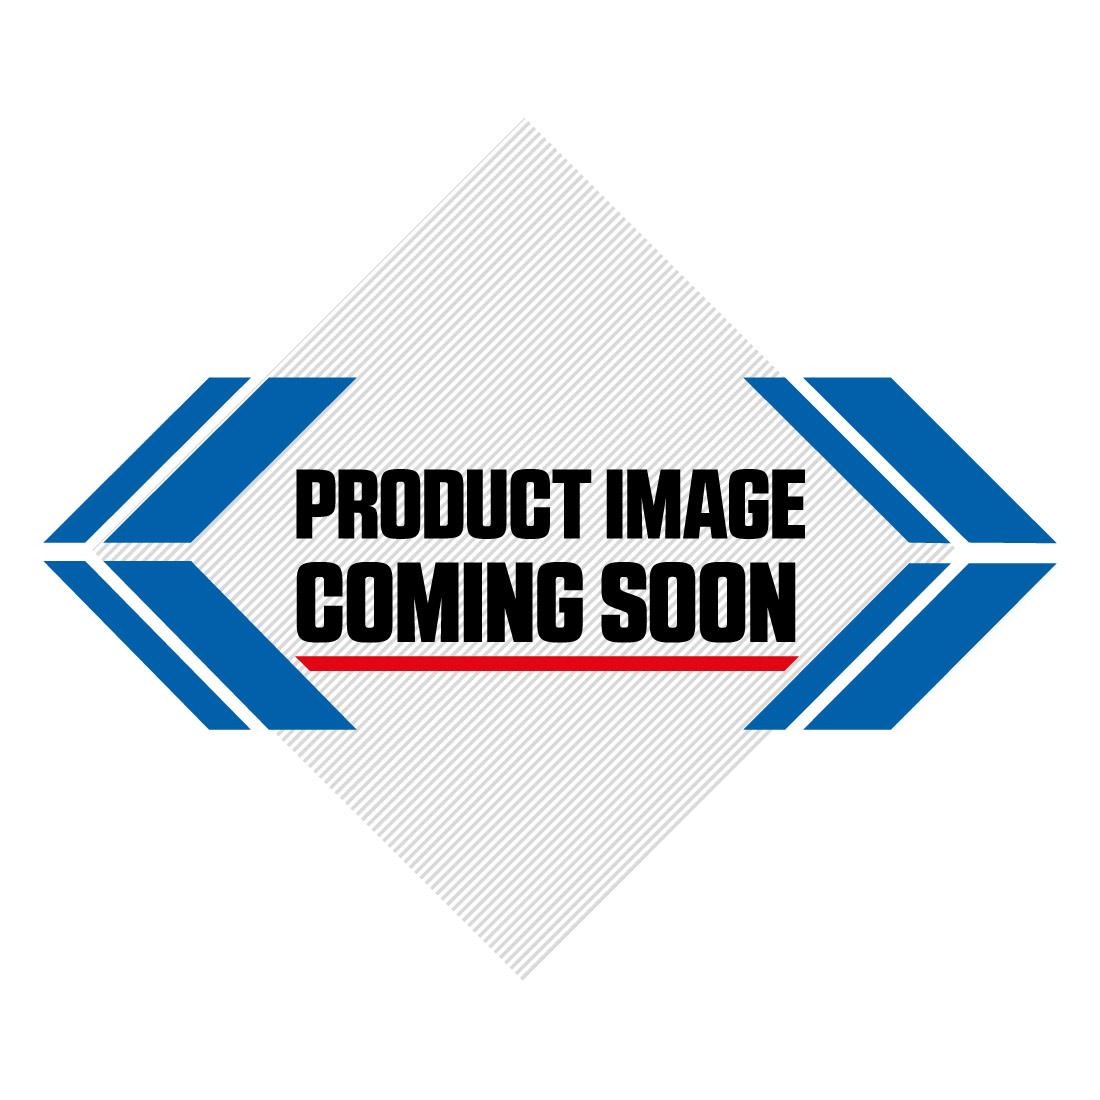 Suzuki Plastic Kit Suzuki RMZ 450 (08-17) White Image-5